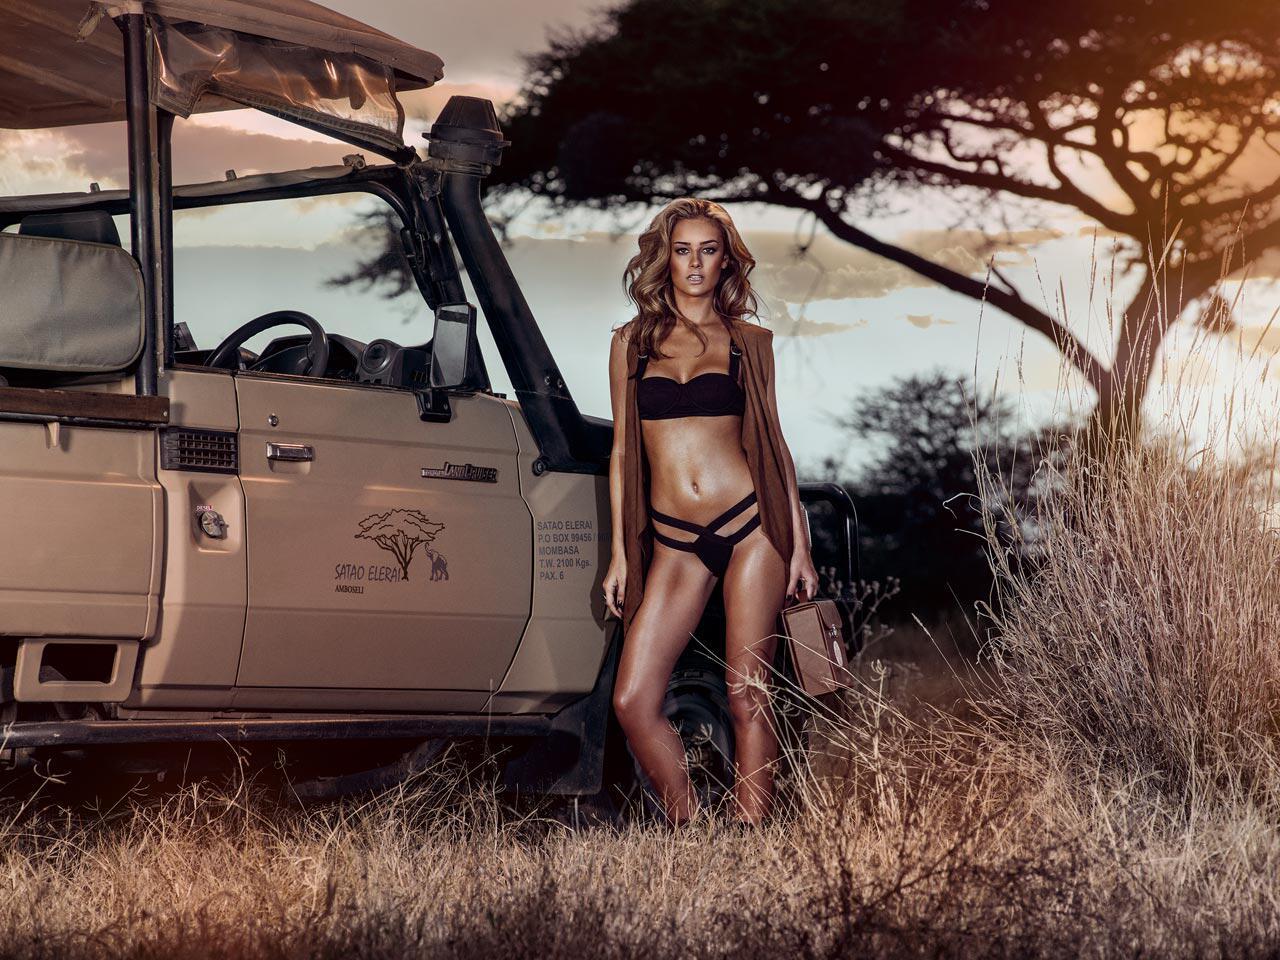 Bild zu Tuning-Kalender 2015: Veronika Klimovits in Kenia